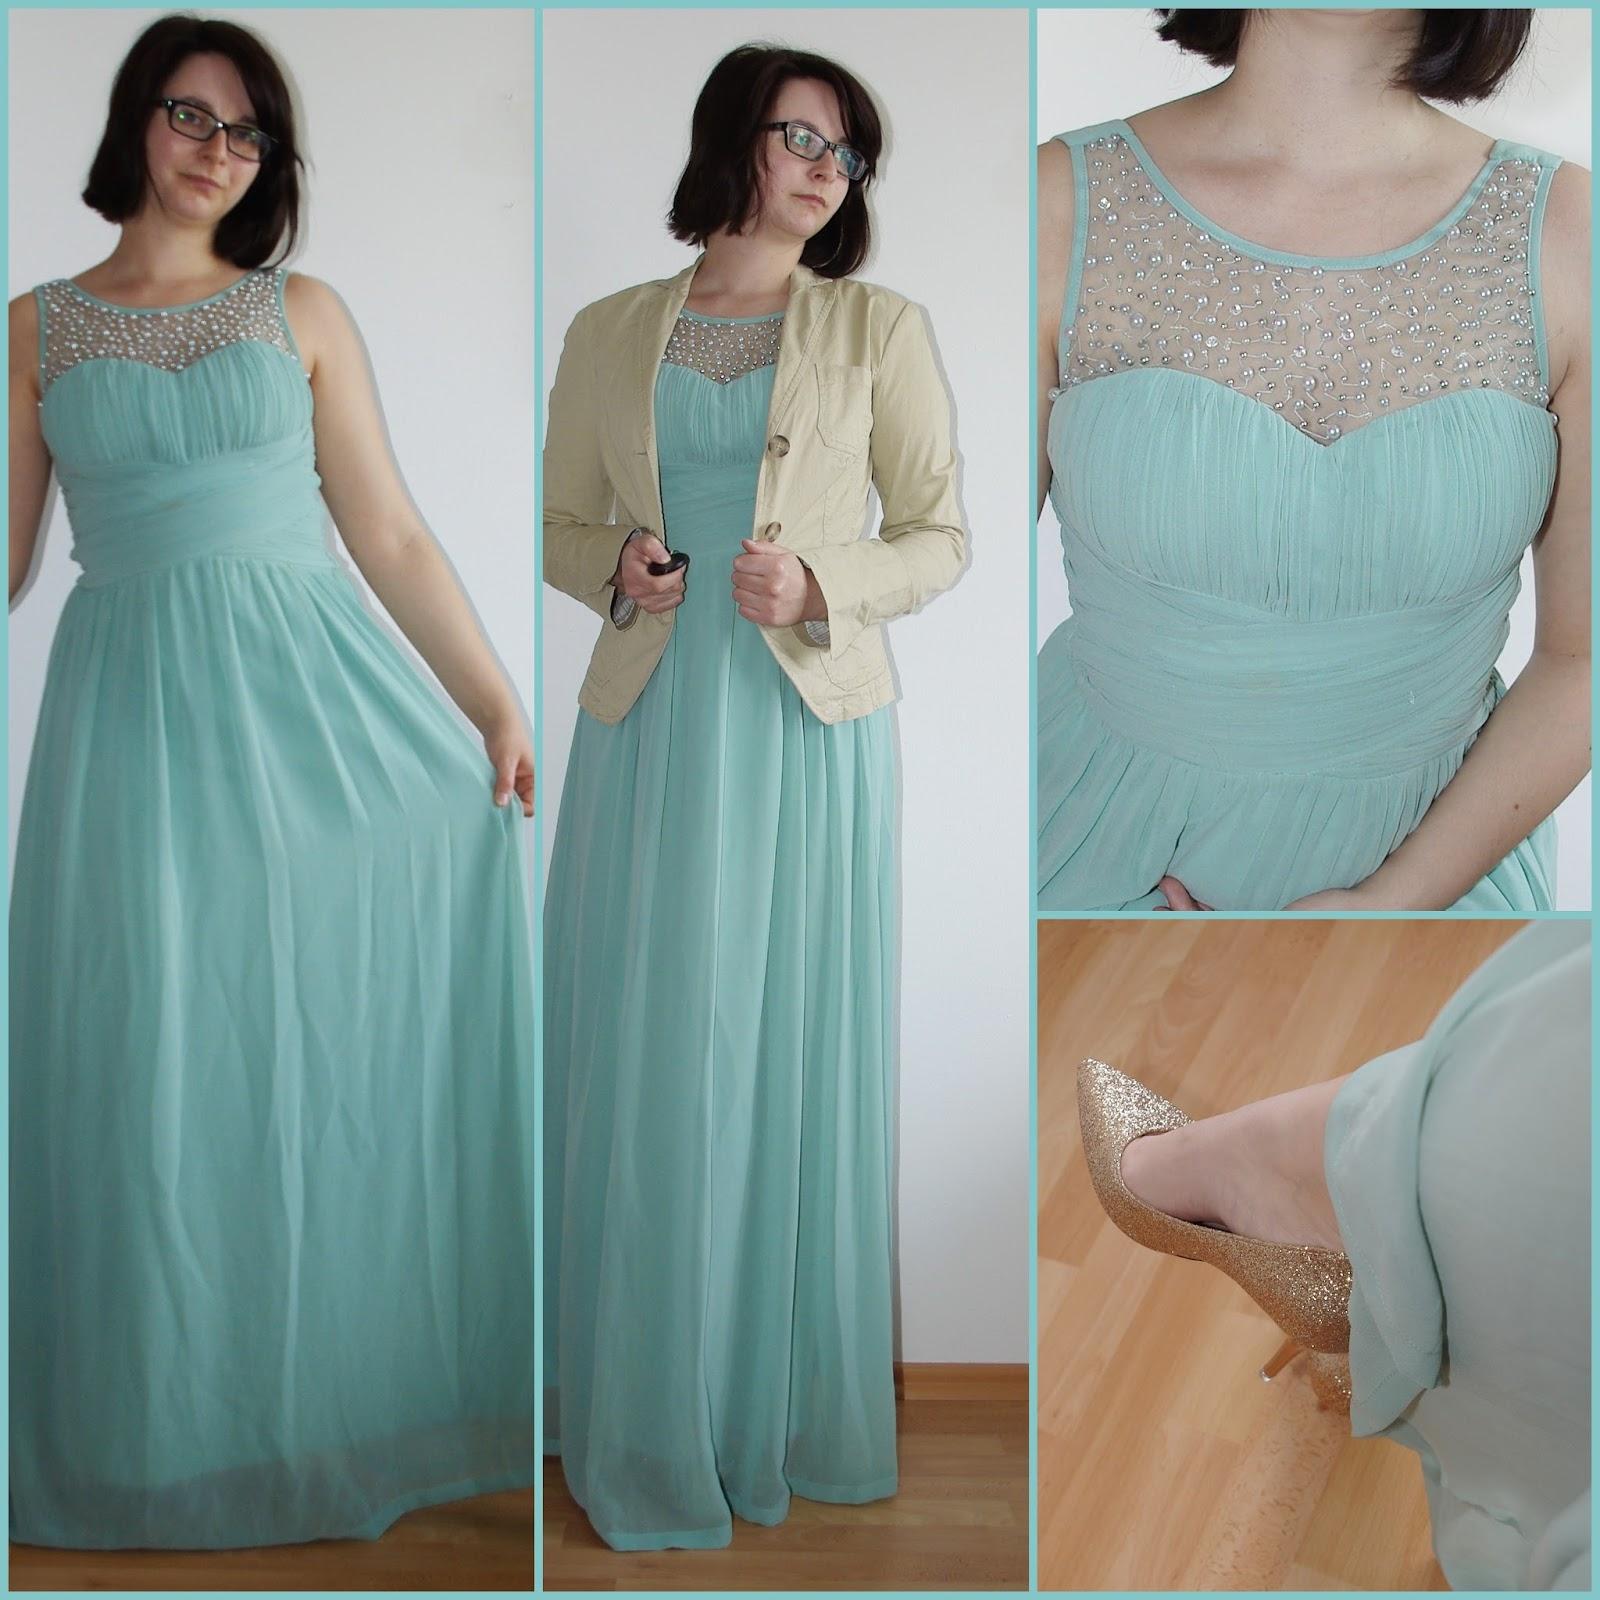 Lucciola [Fashion] Enchanted Embellished Mint Dress